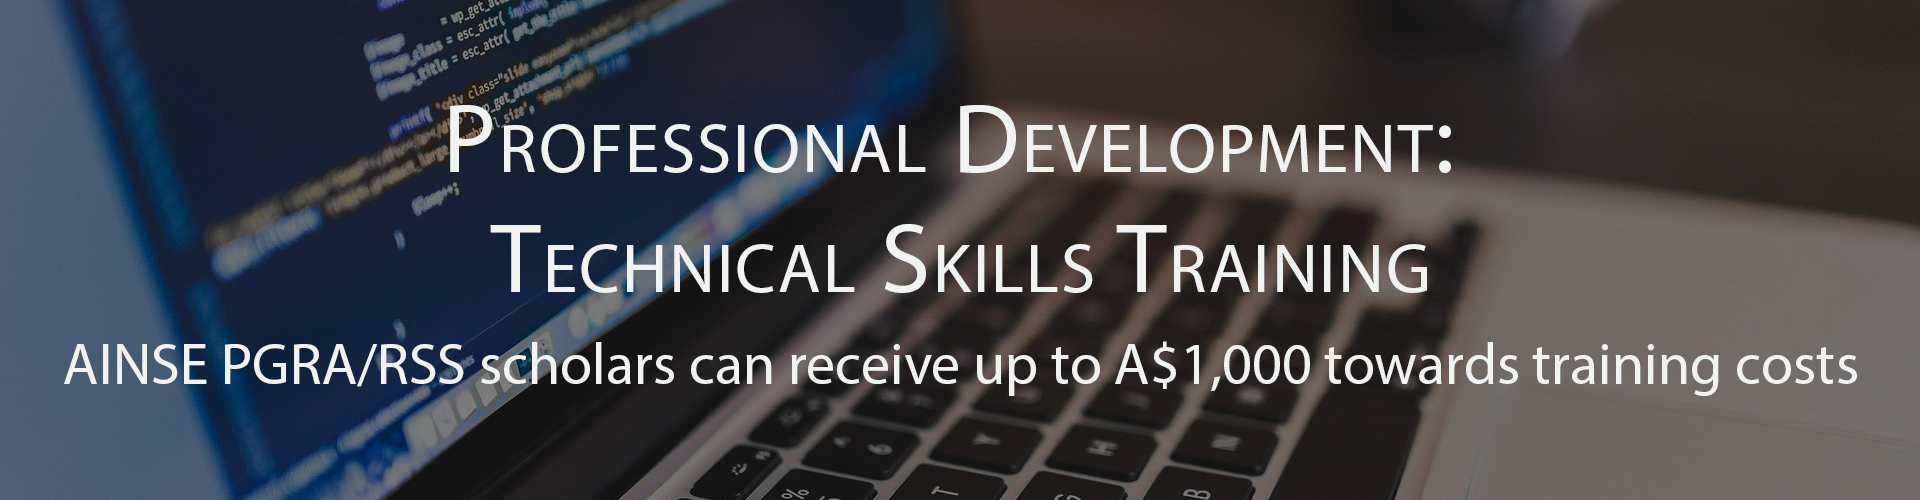 PD - Technical Skills